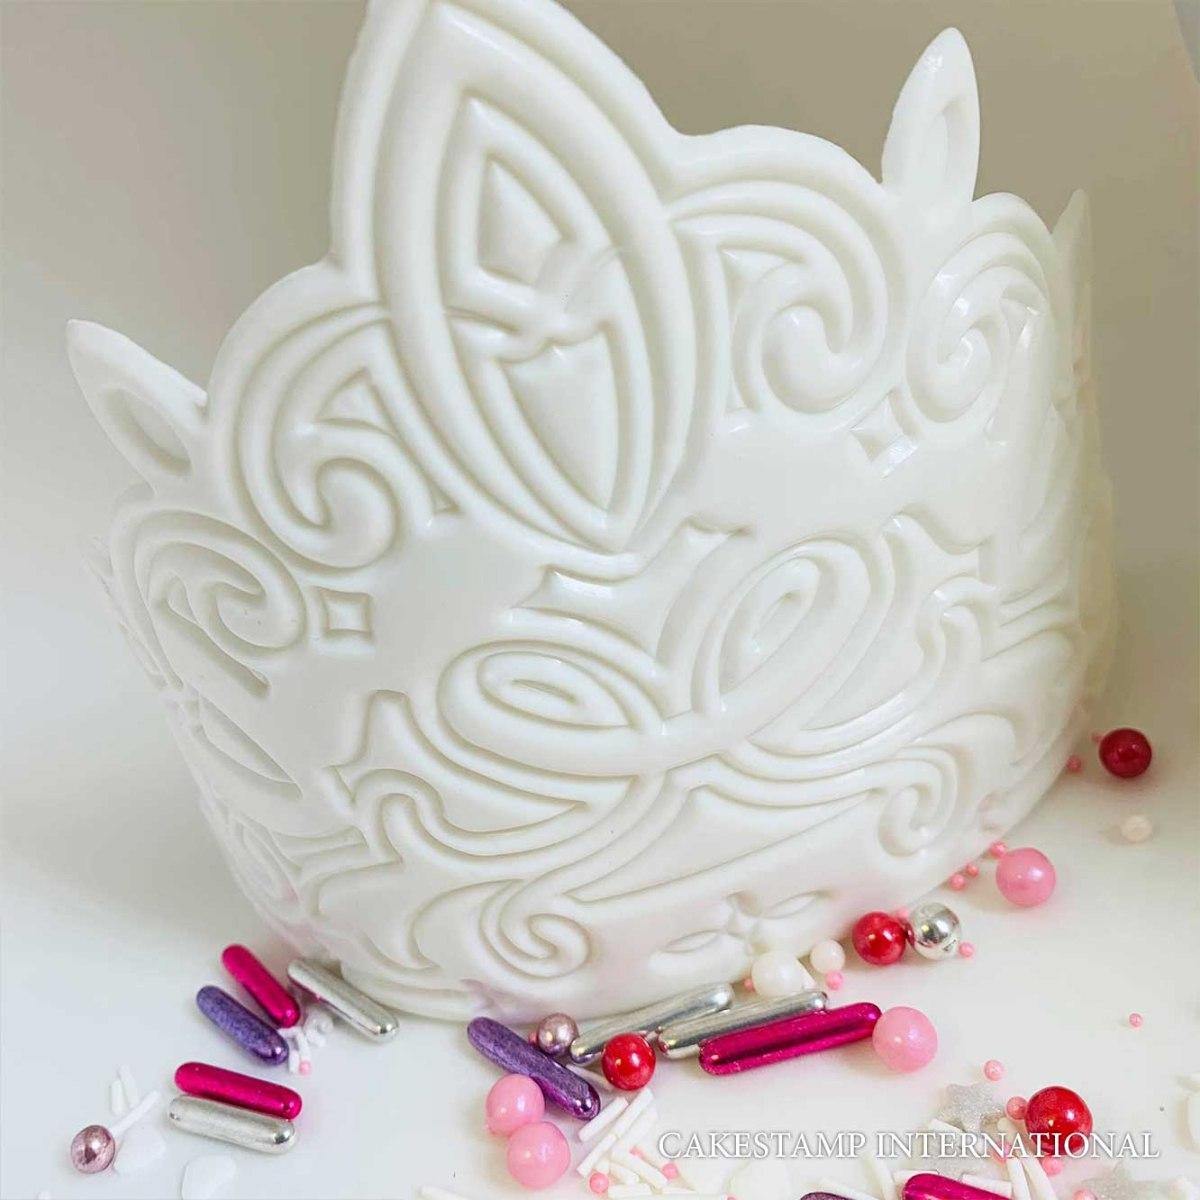 MARRAKESH CROWN Chocolate mold | Crown DIY Sugar Craft Fondant Chocolate Mold Decorating Tools